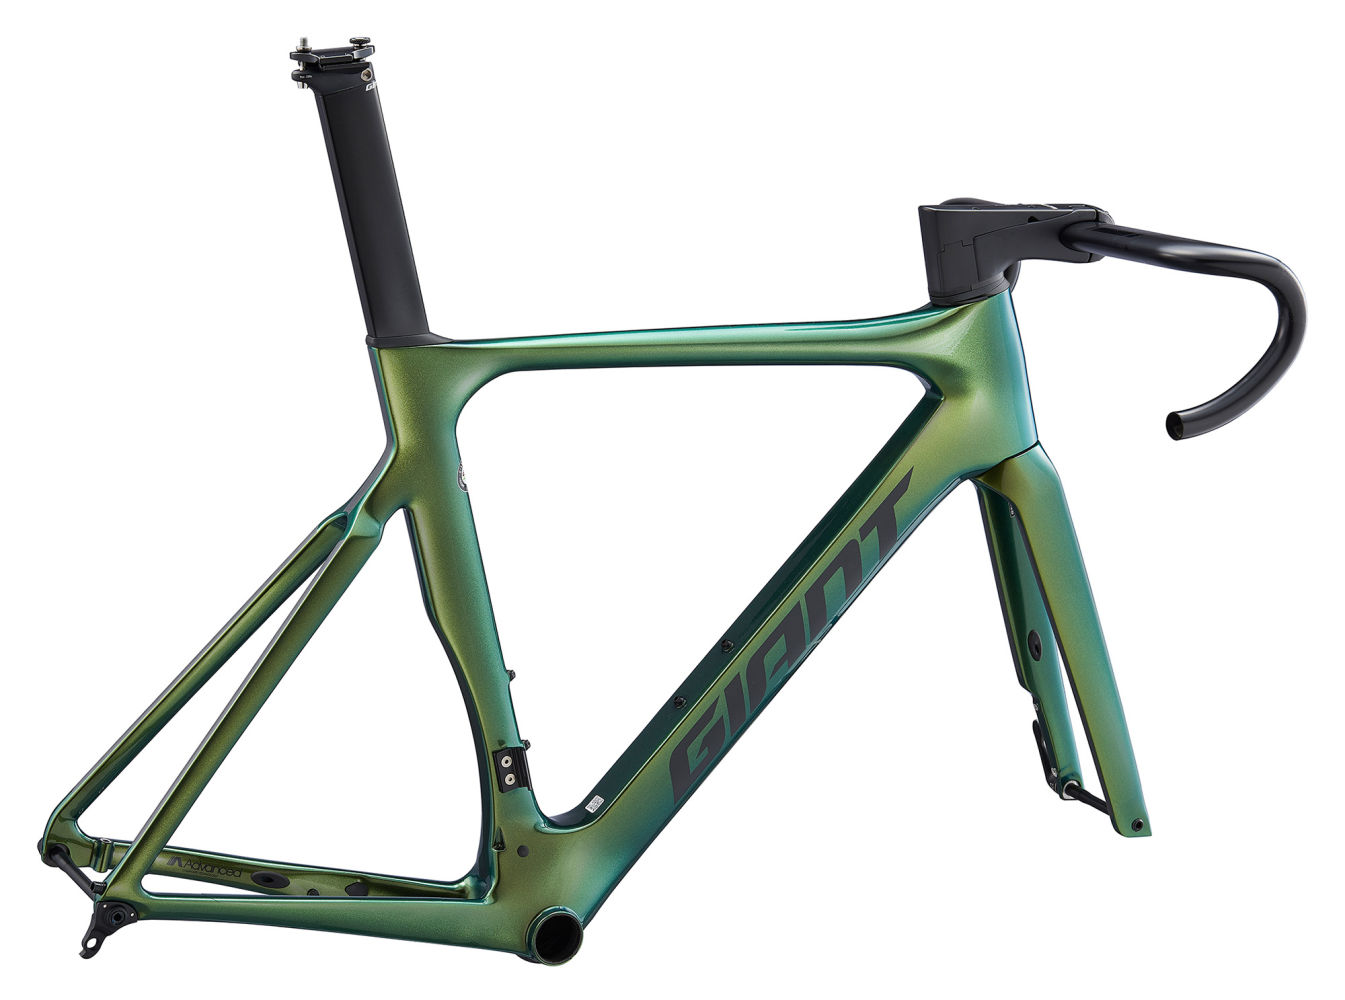 Best Road Bikes 2020.2020 Giant Propel Advanced Pro Disc Carbon Road Bike Frameset In Green